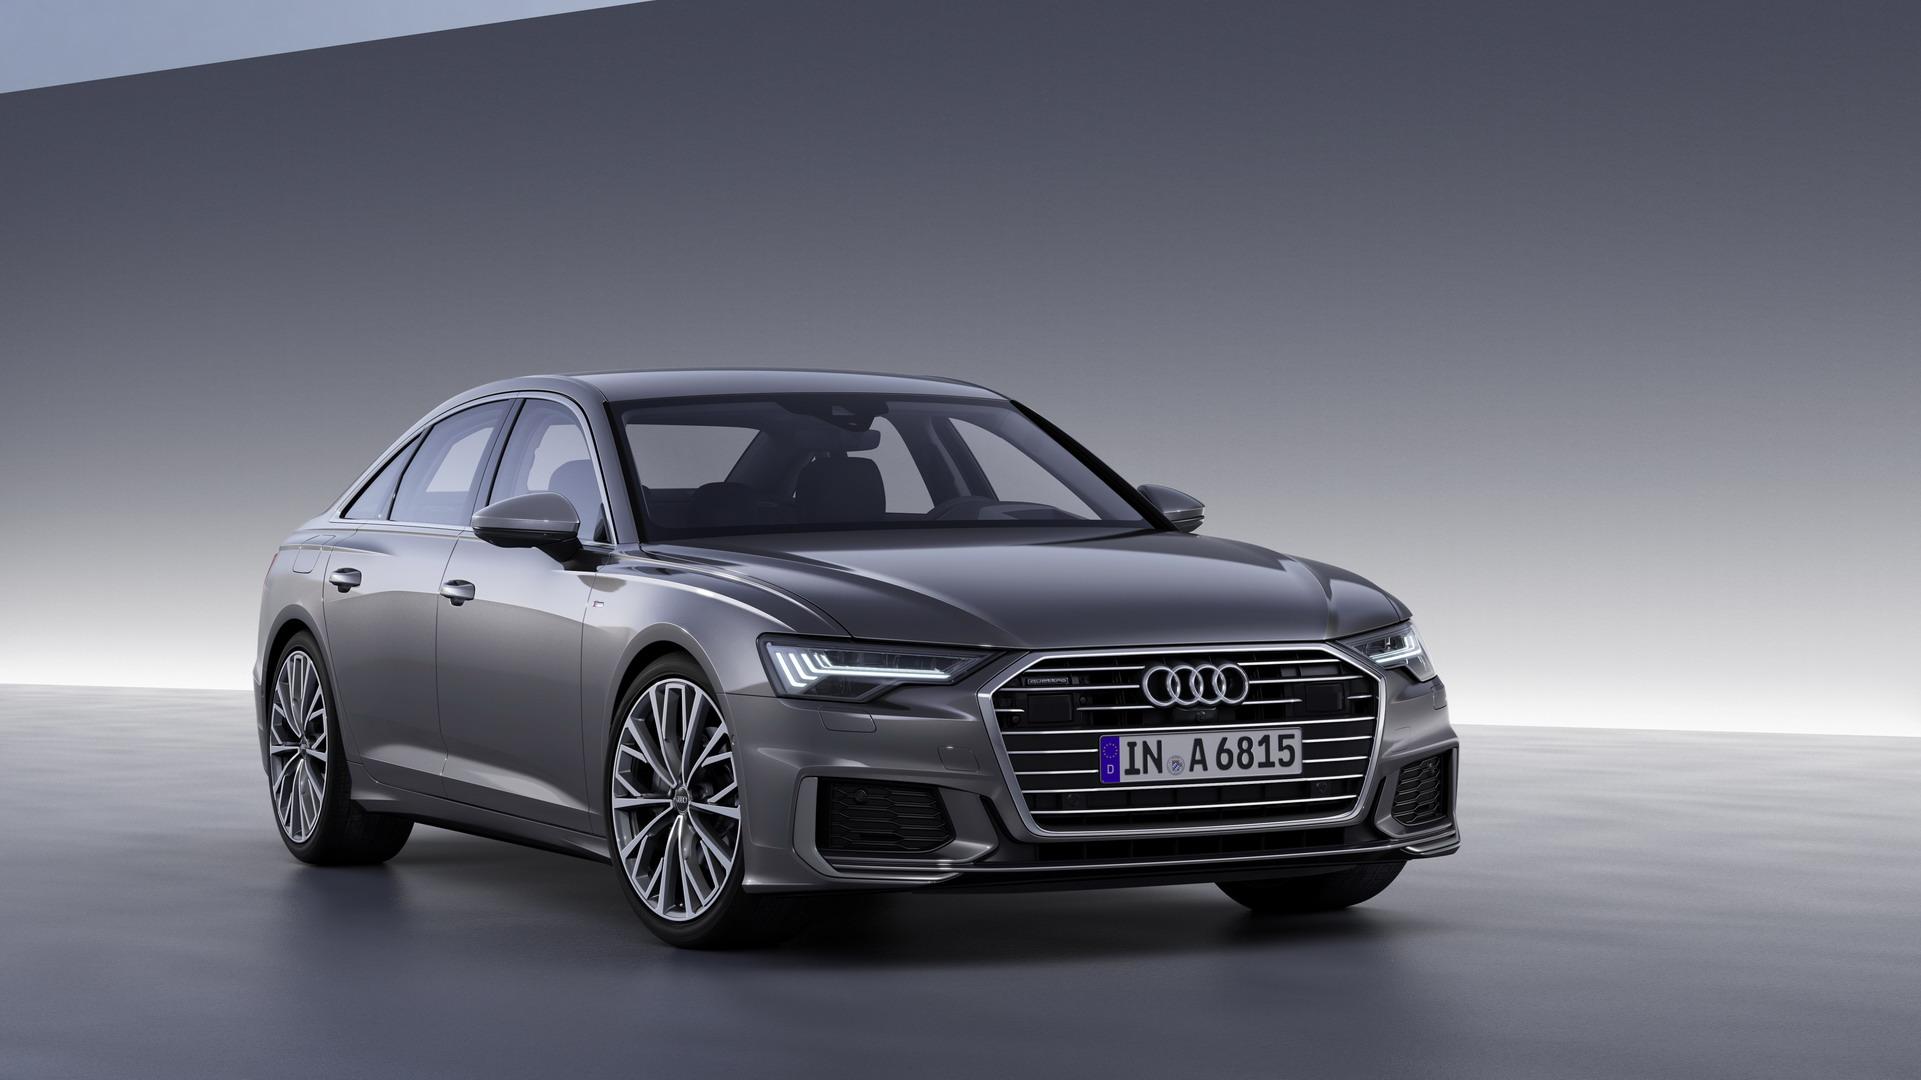 Audi A6 2018 (16)